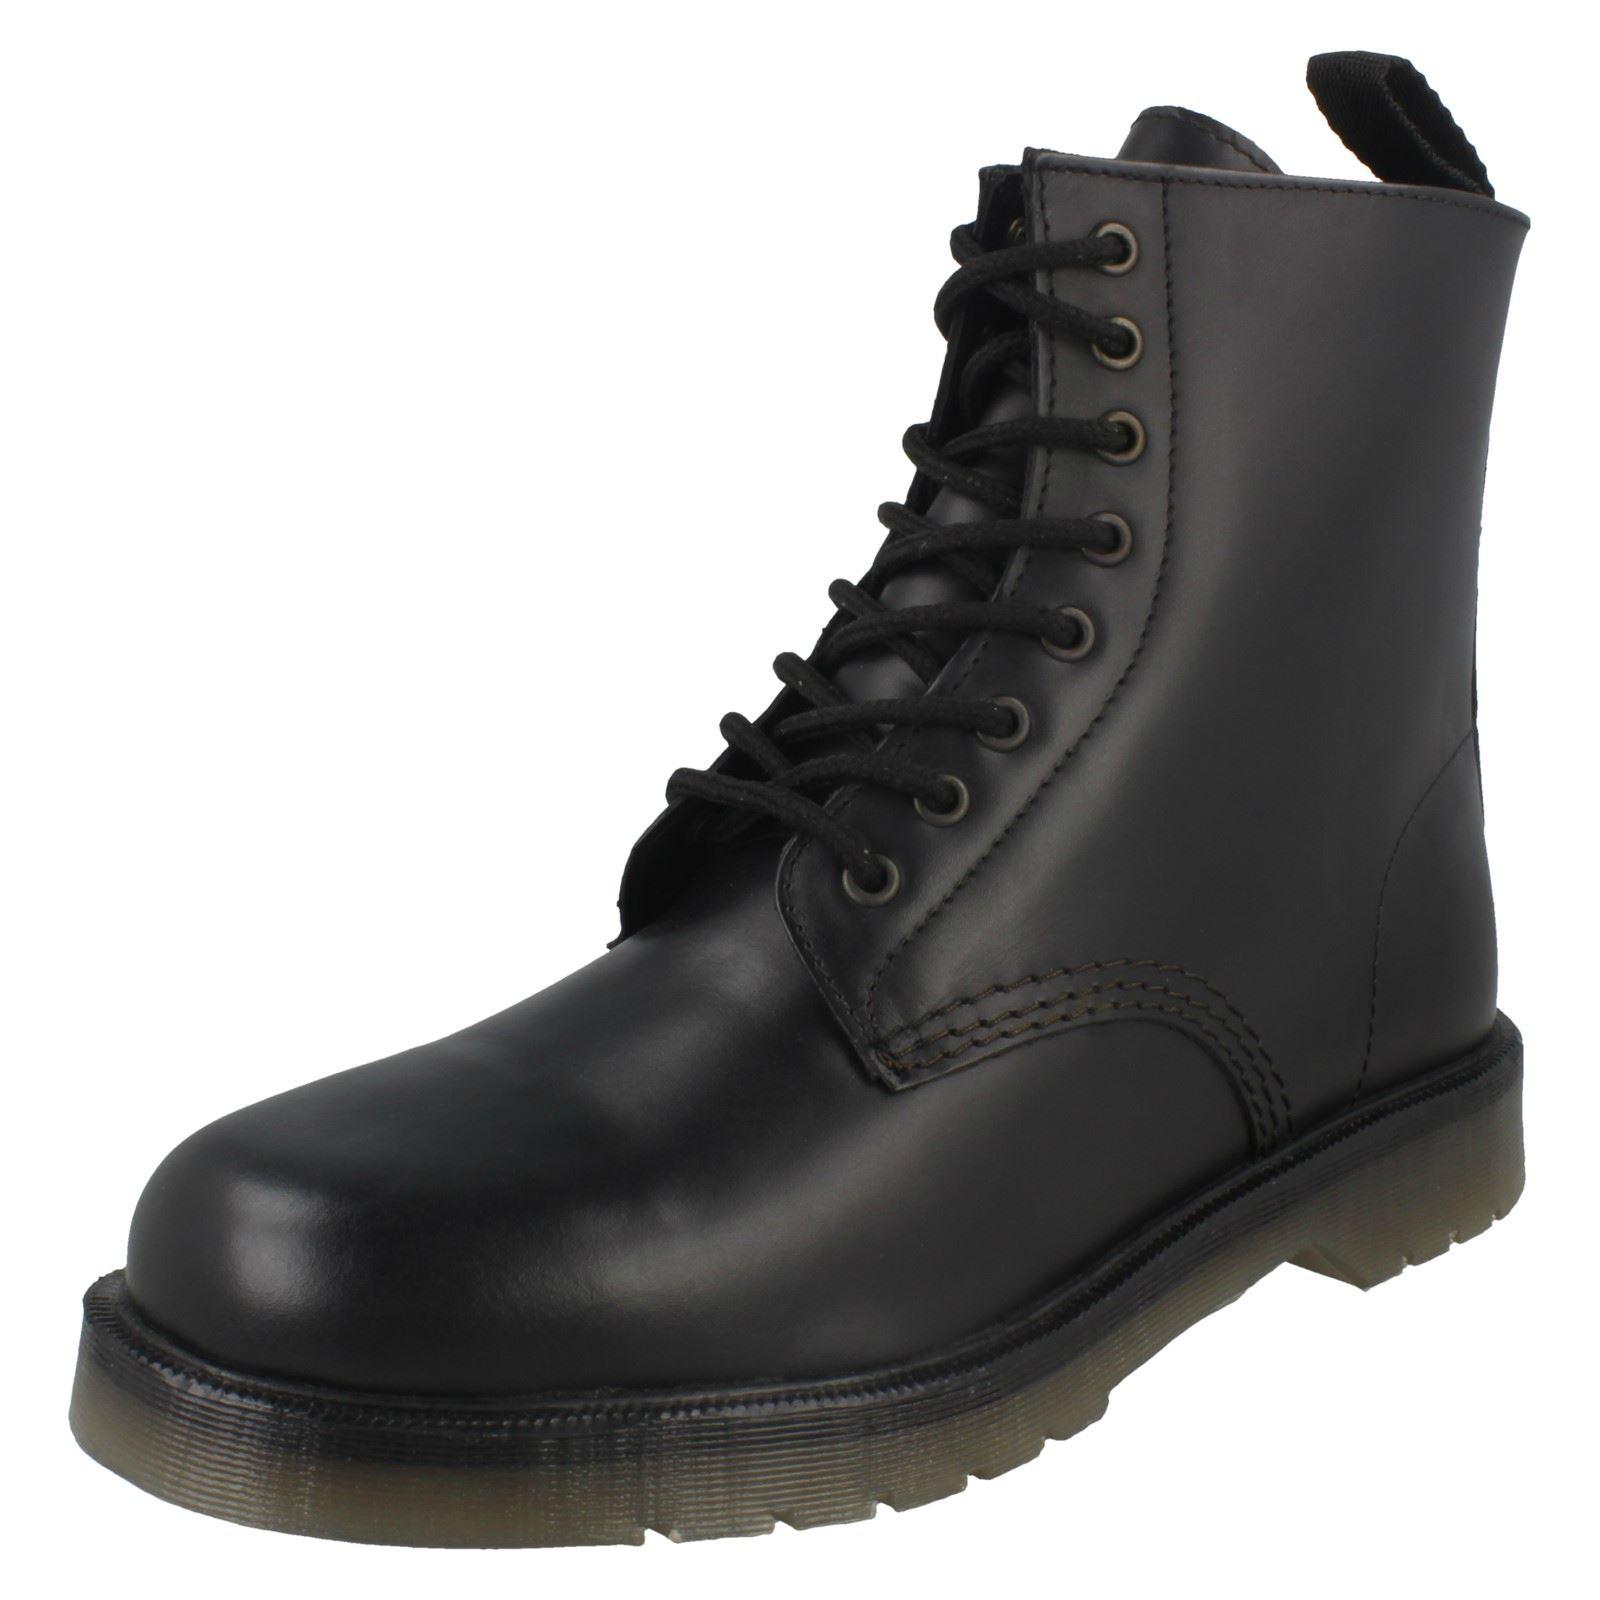 Herren Maverick 'Militär Stil' Stil' Stil' Schnürsiefel 823f5a